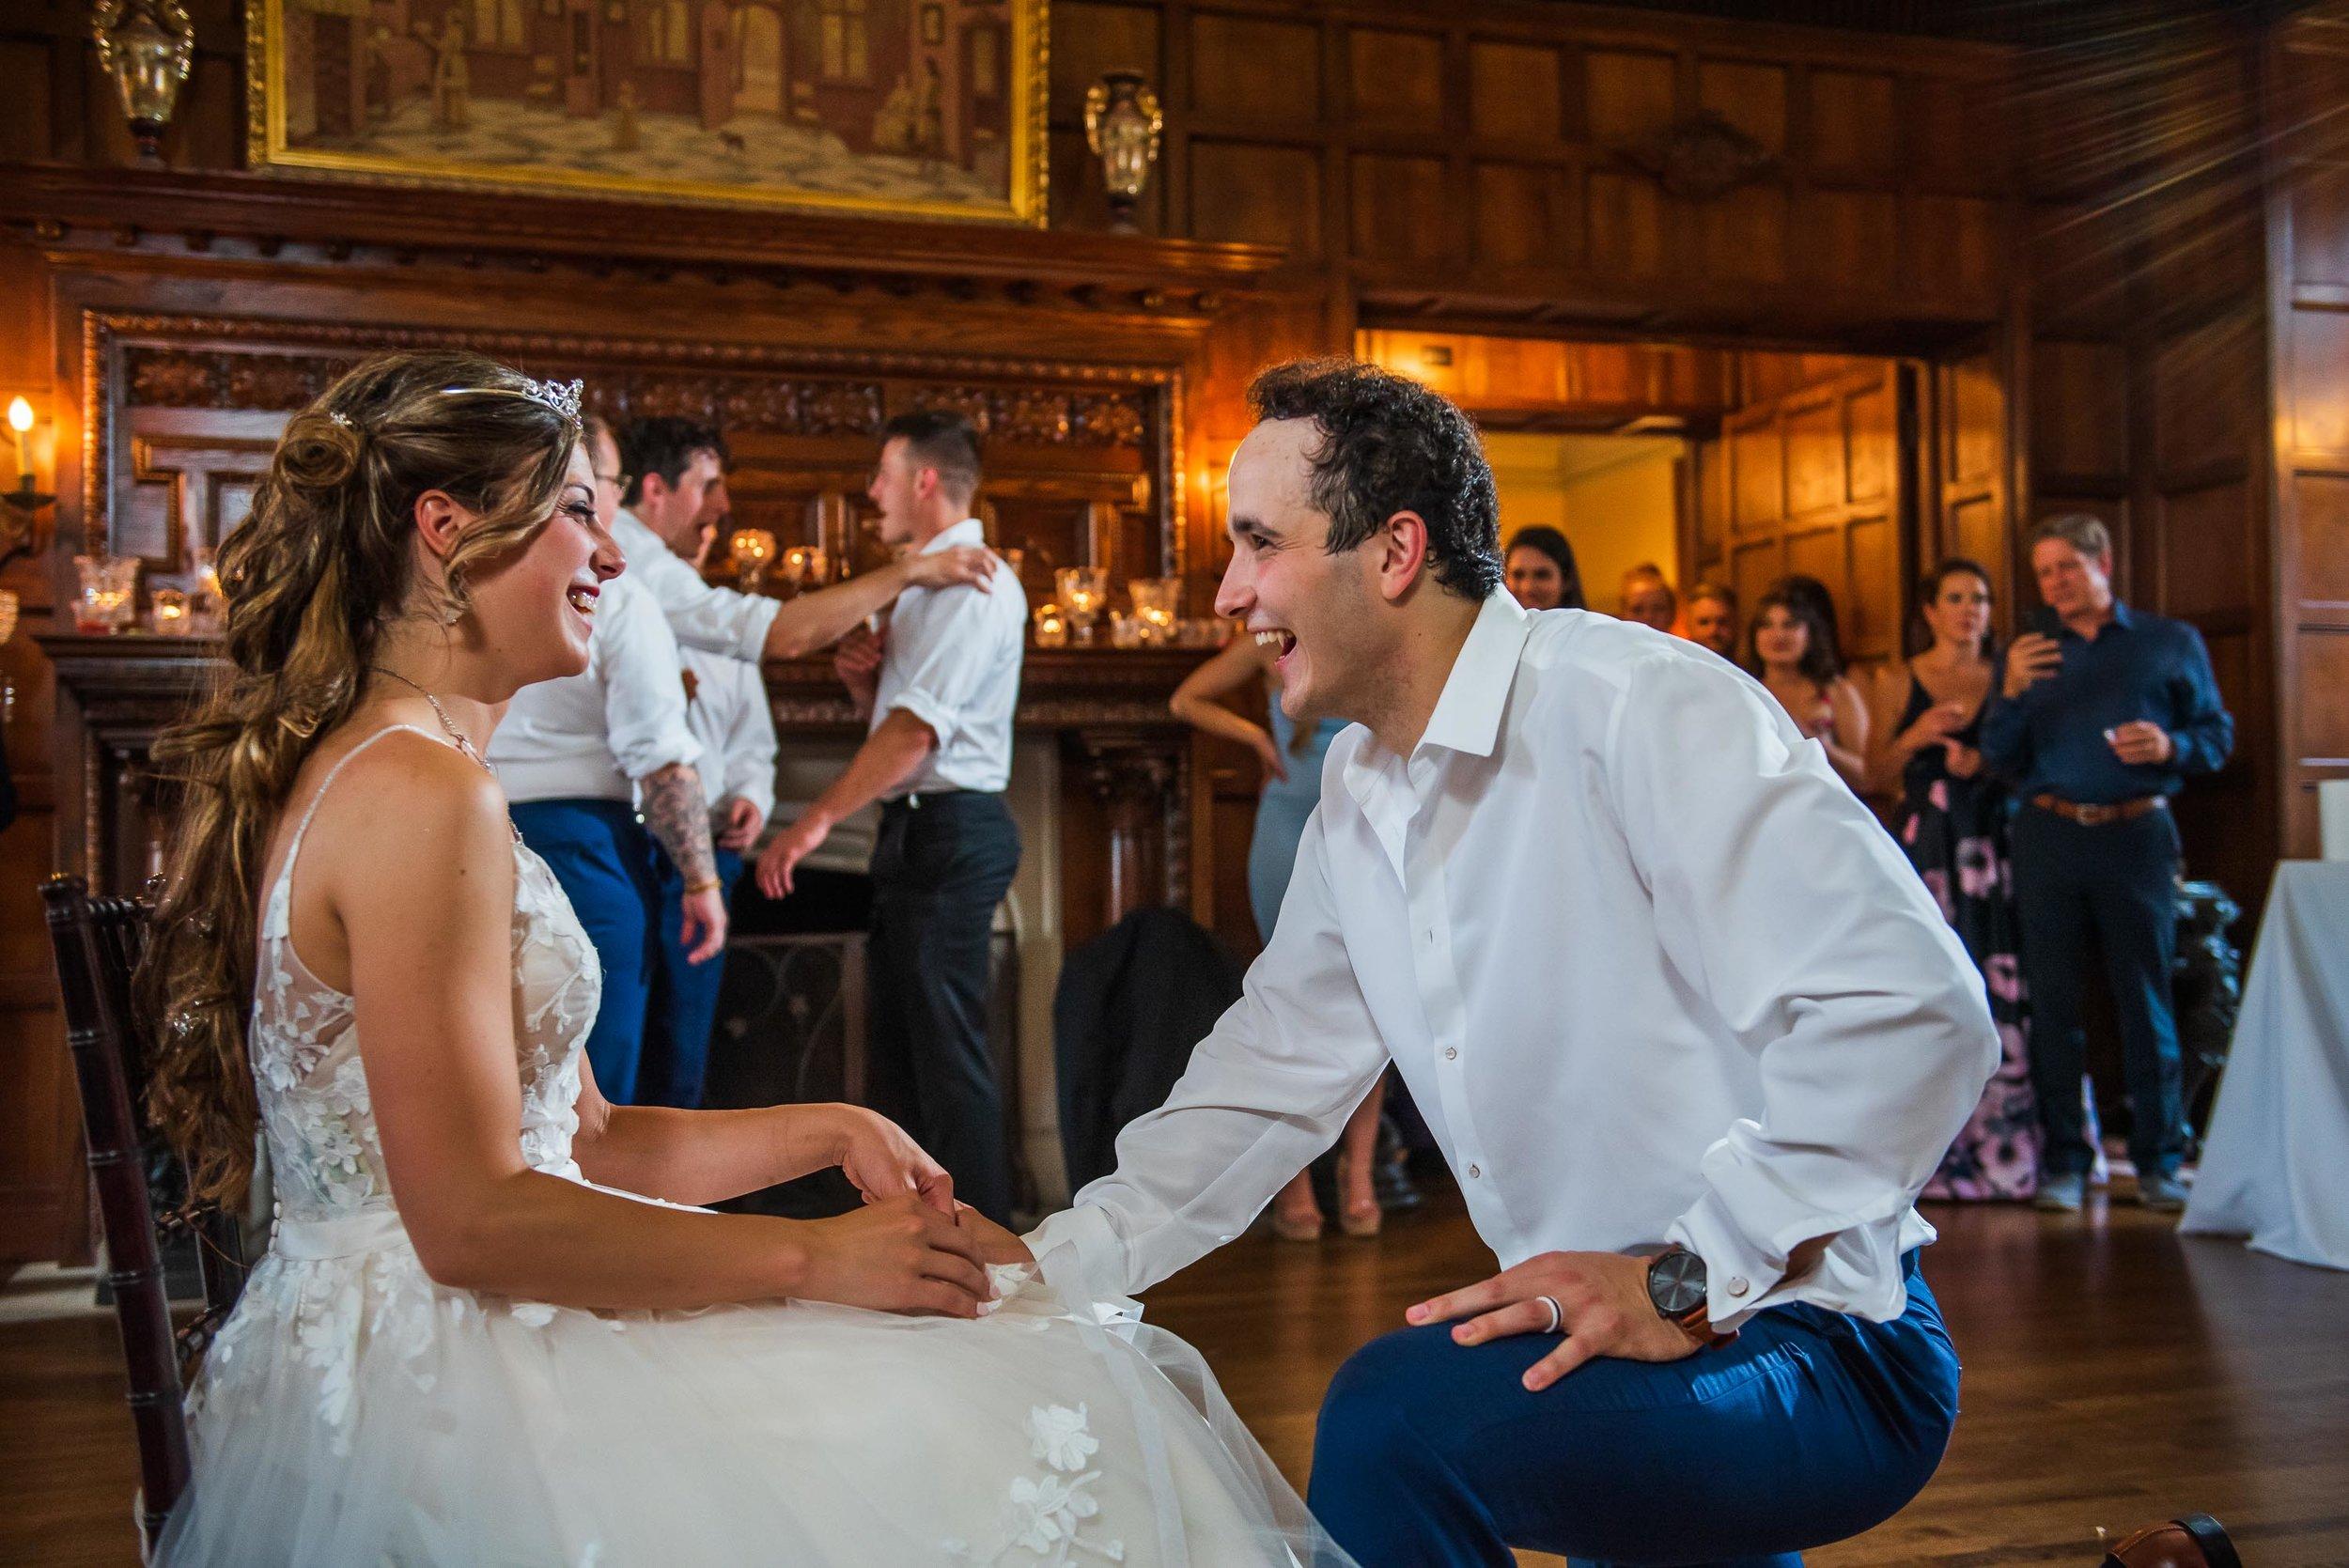 thornewood castle wedding 81.jpg